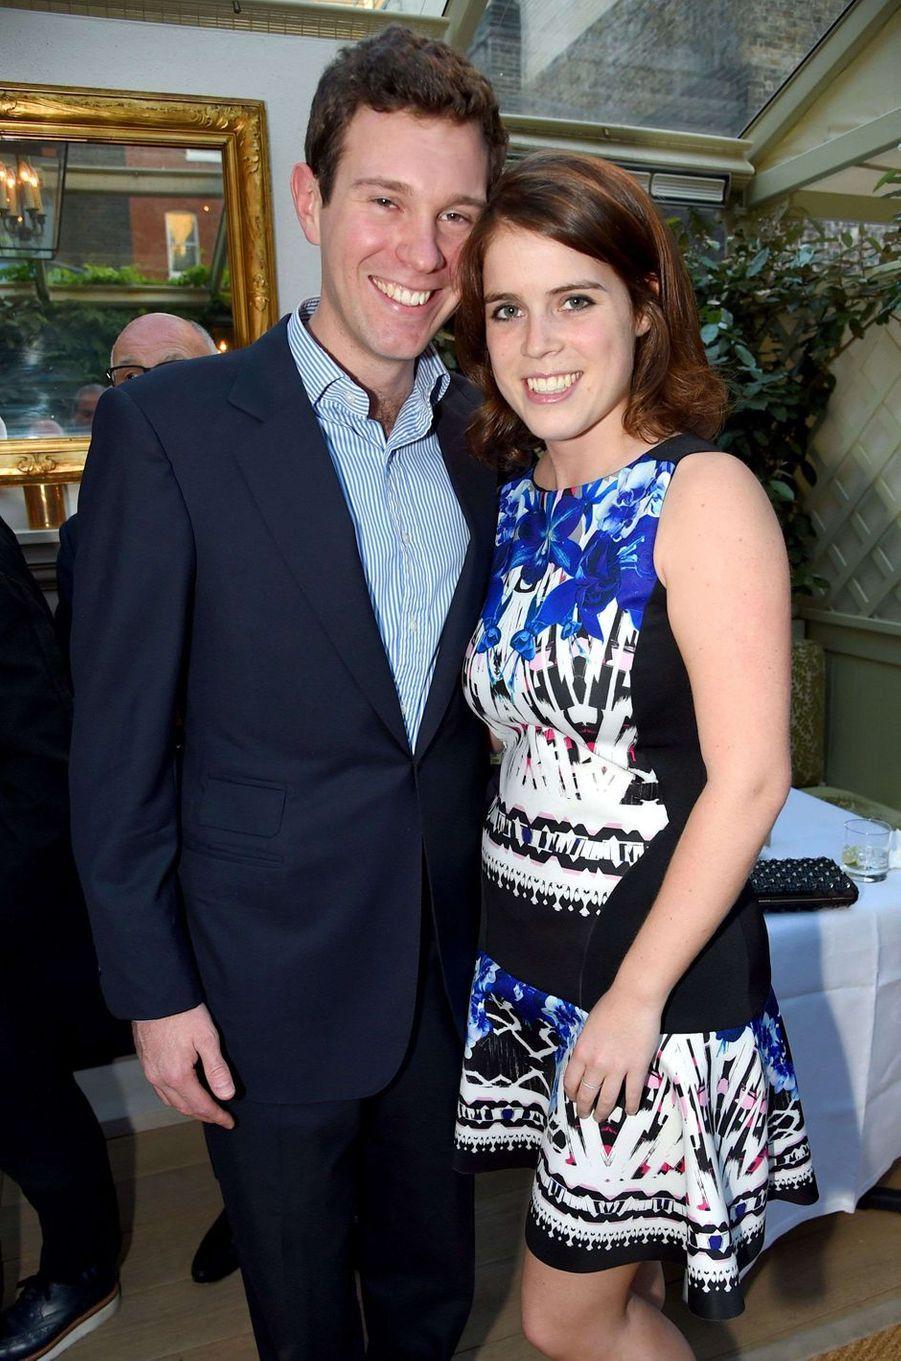 La princesse Eugenie d'York et Jack Brooksbank, le 3 juillet 2014